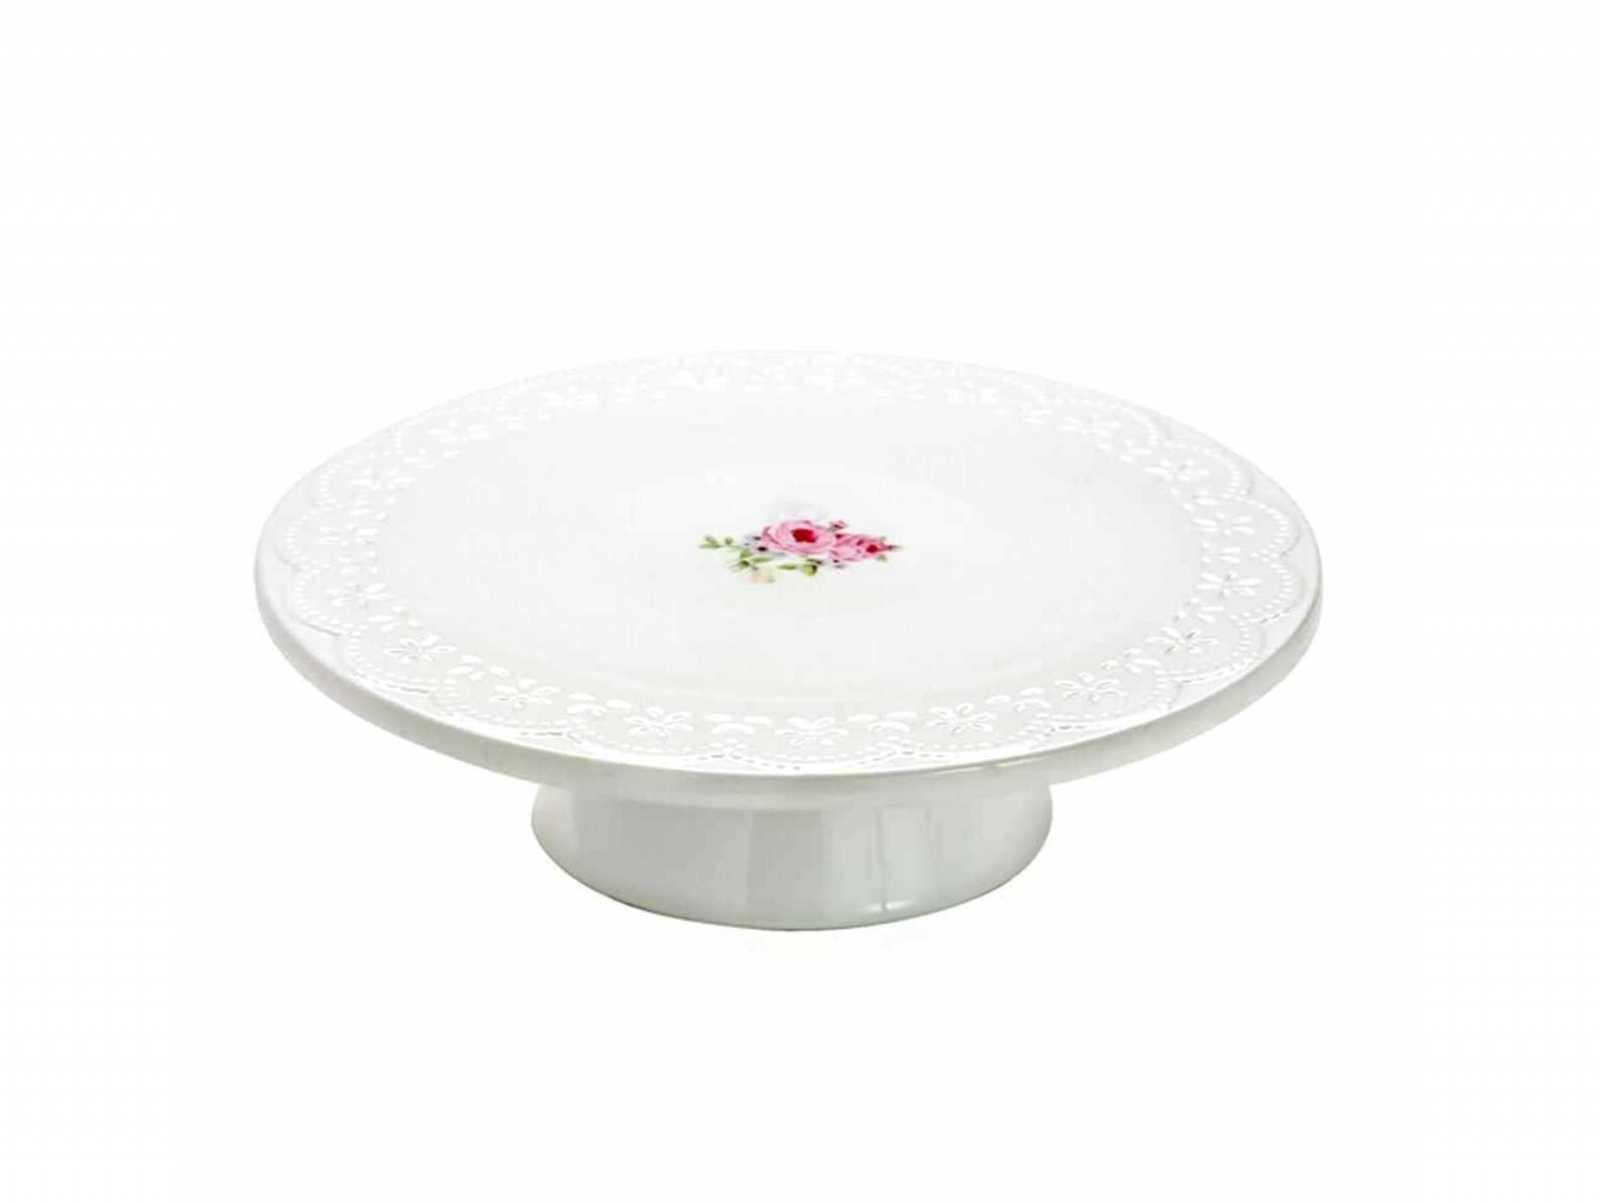 Онлайн каталог PROMENU: Блюдо для торта Nuova R2S BELLE MAISON, диаметр 26 см, белый с розами Nuova R2S 1027 RSE